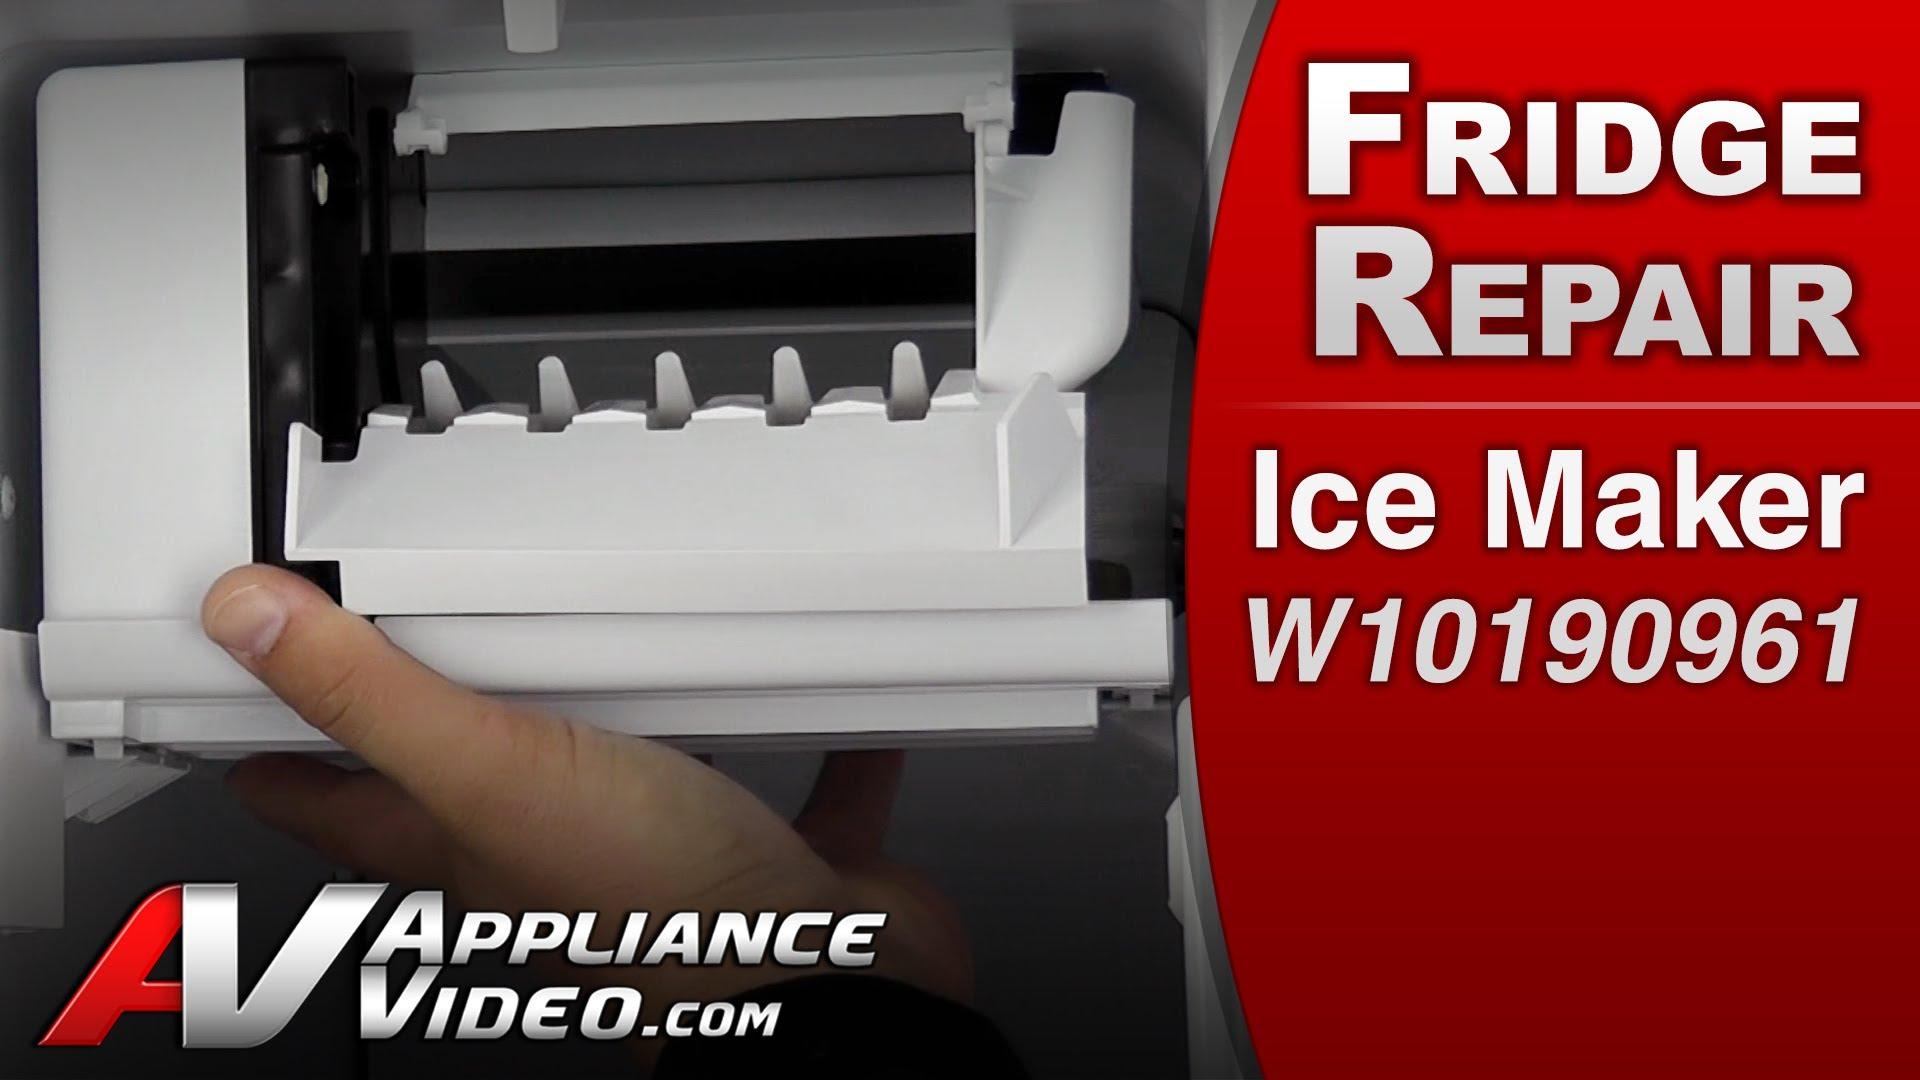 Whirlpool Ed2khaxvt01 Refrigerator Will Not Make Or